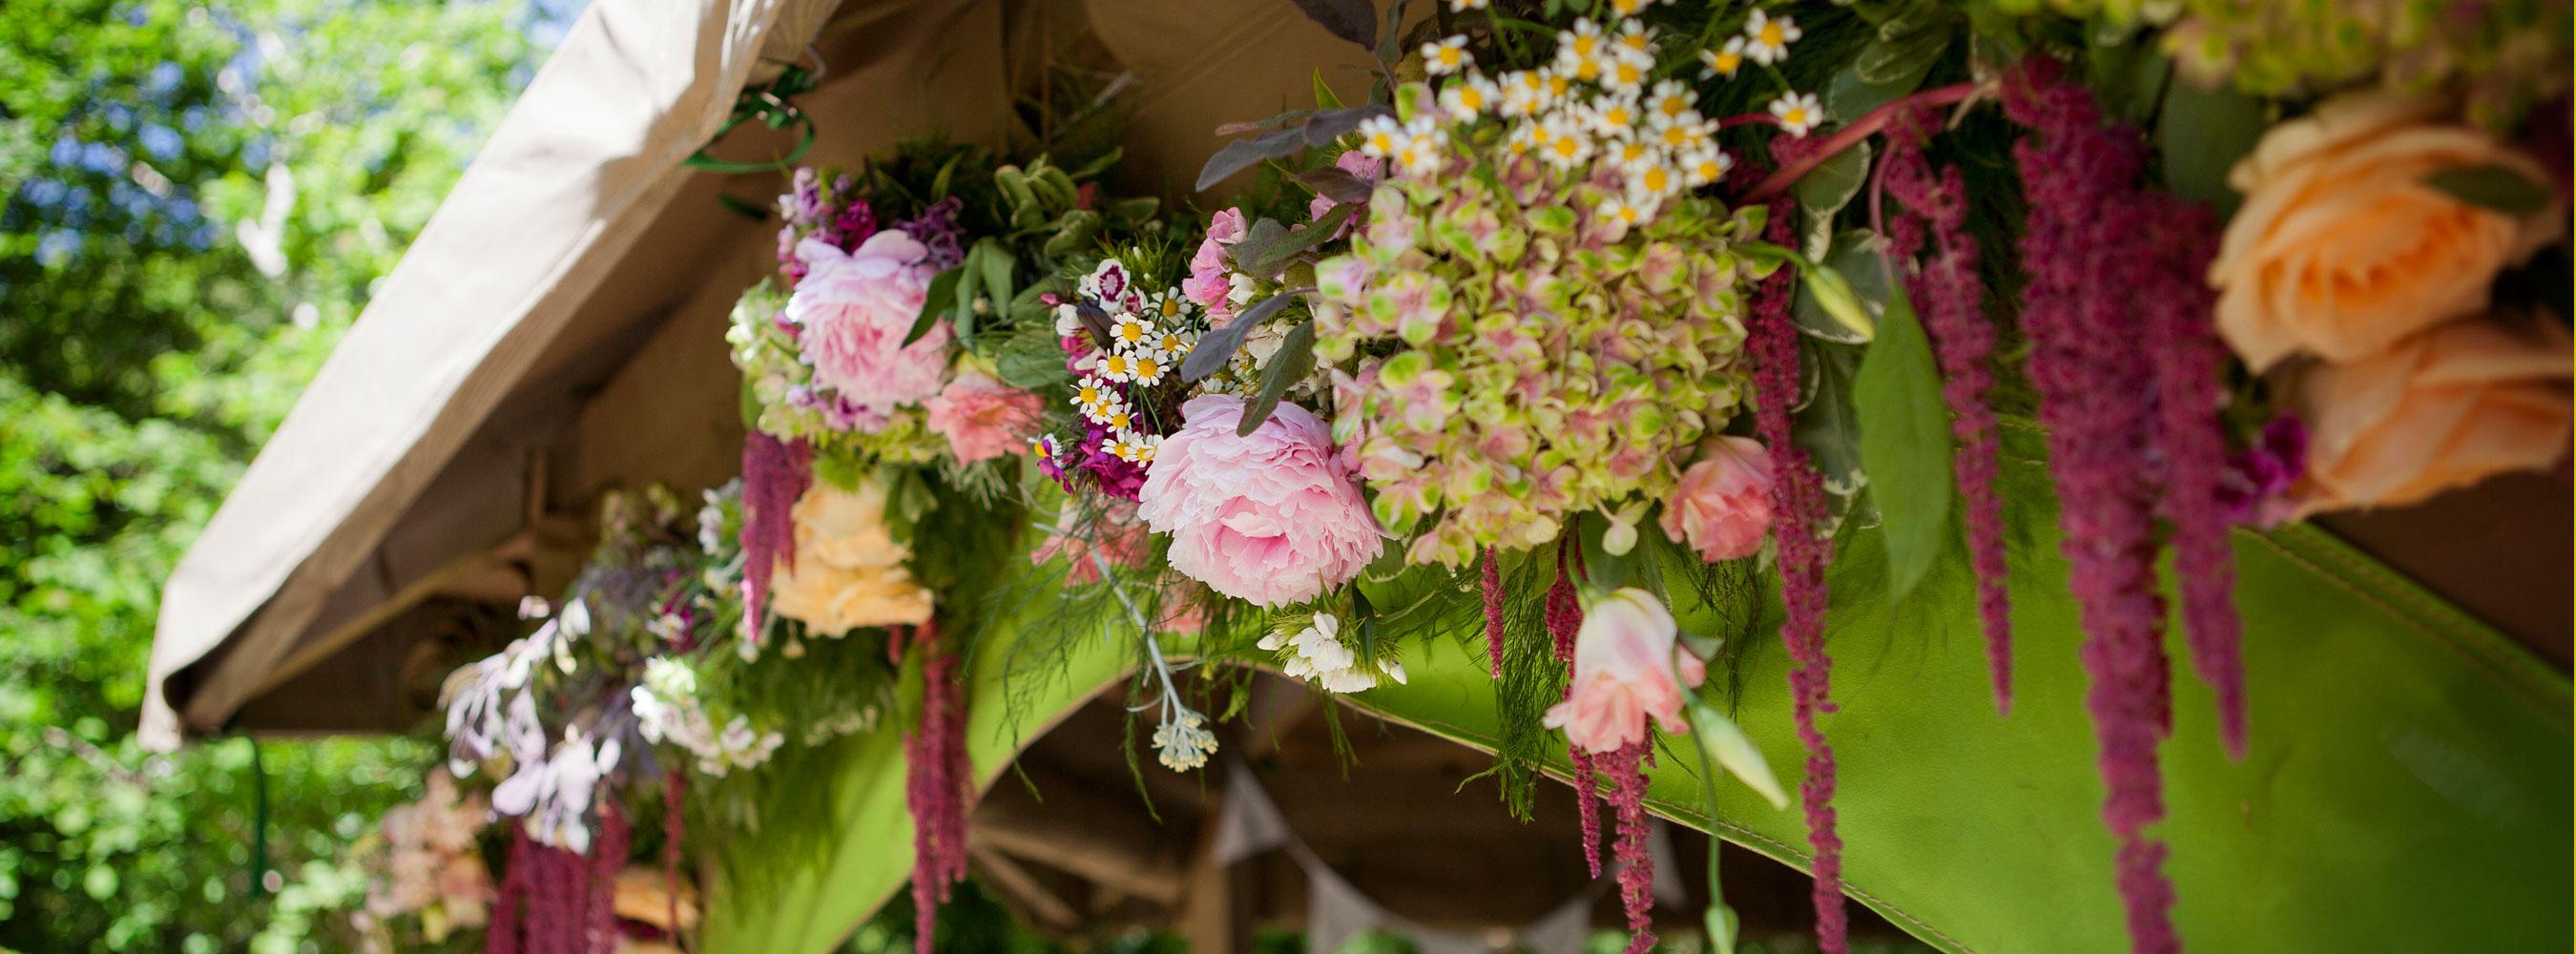 Pavilion Flower Garland Florist Bruallen